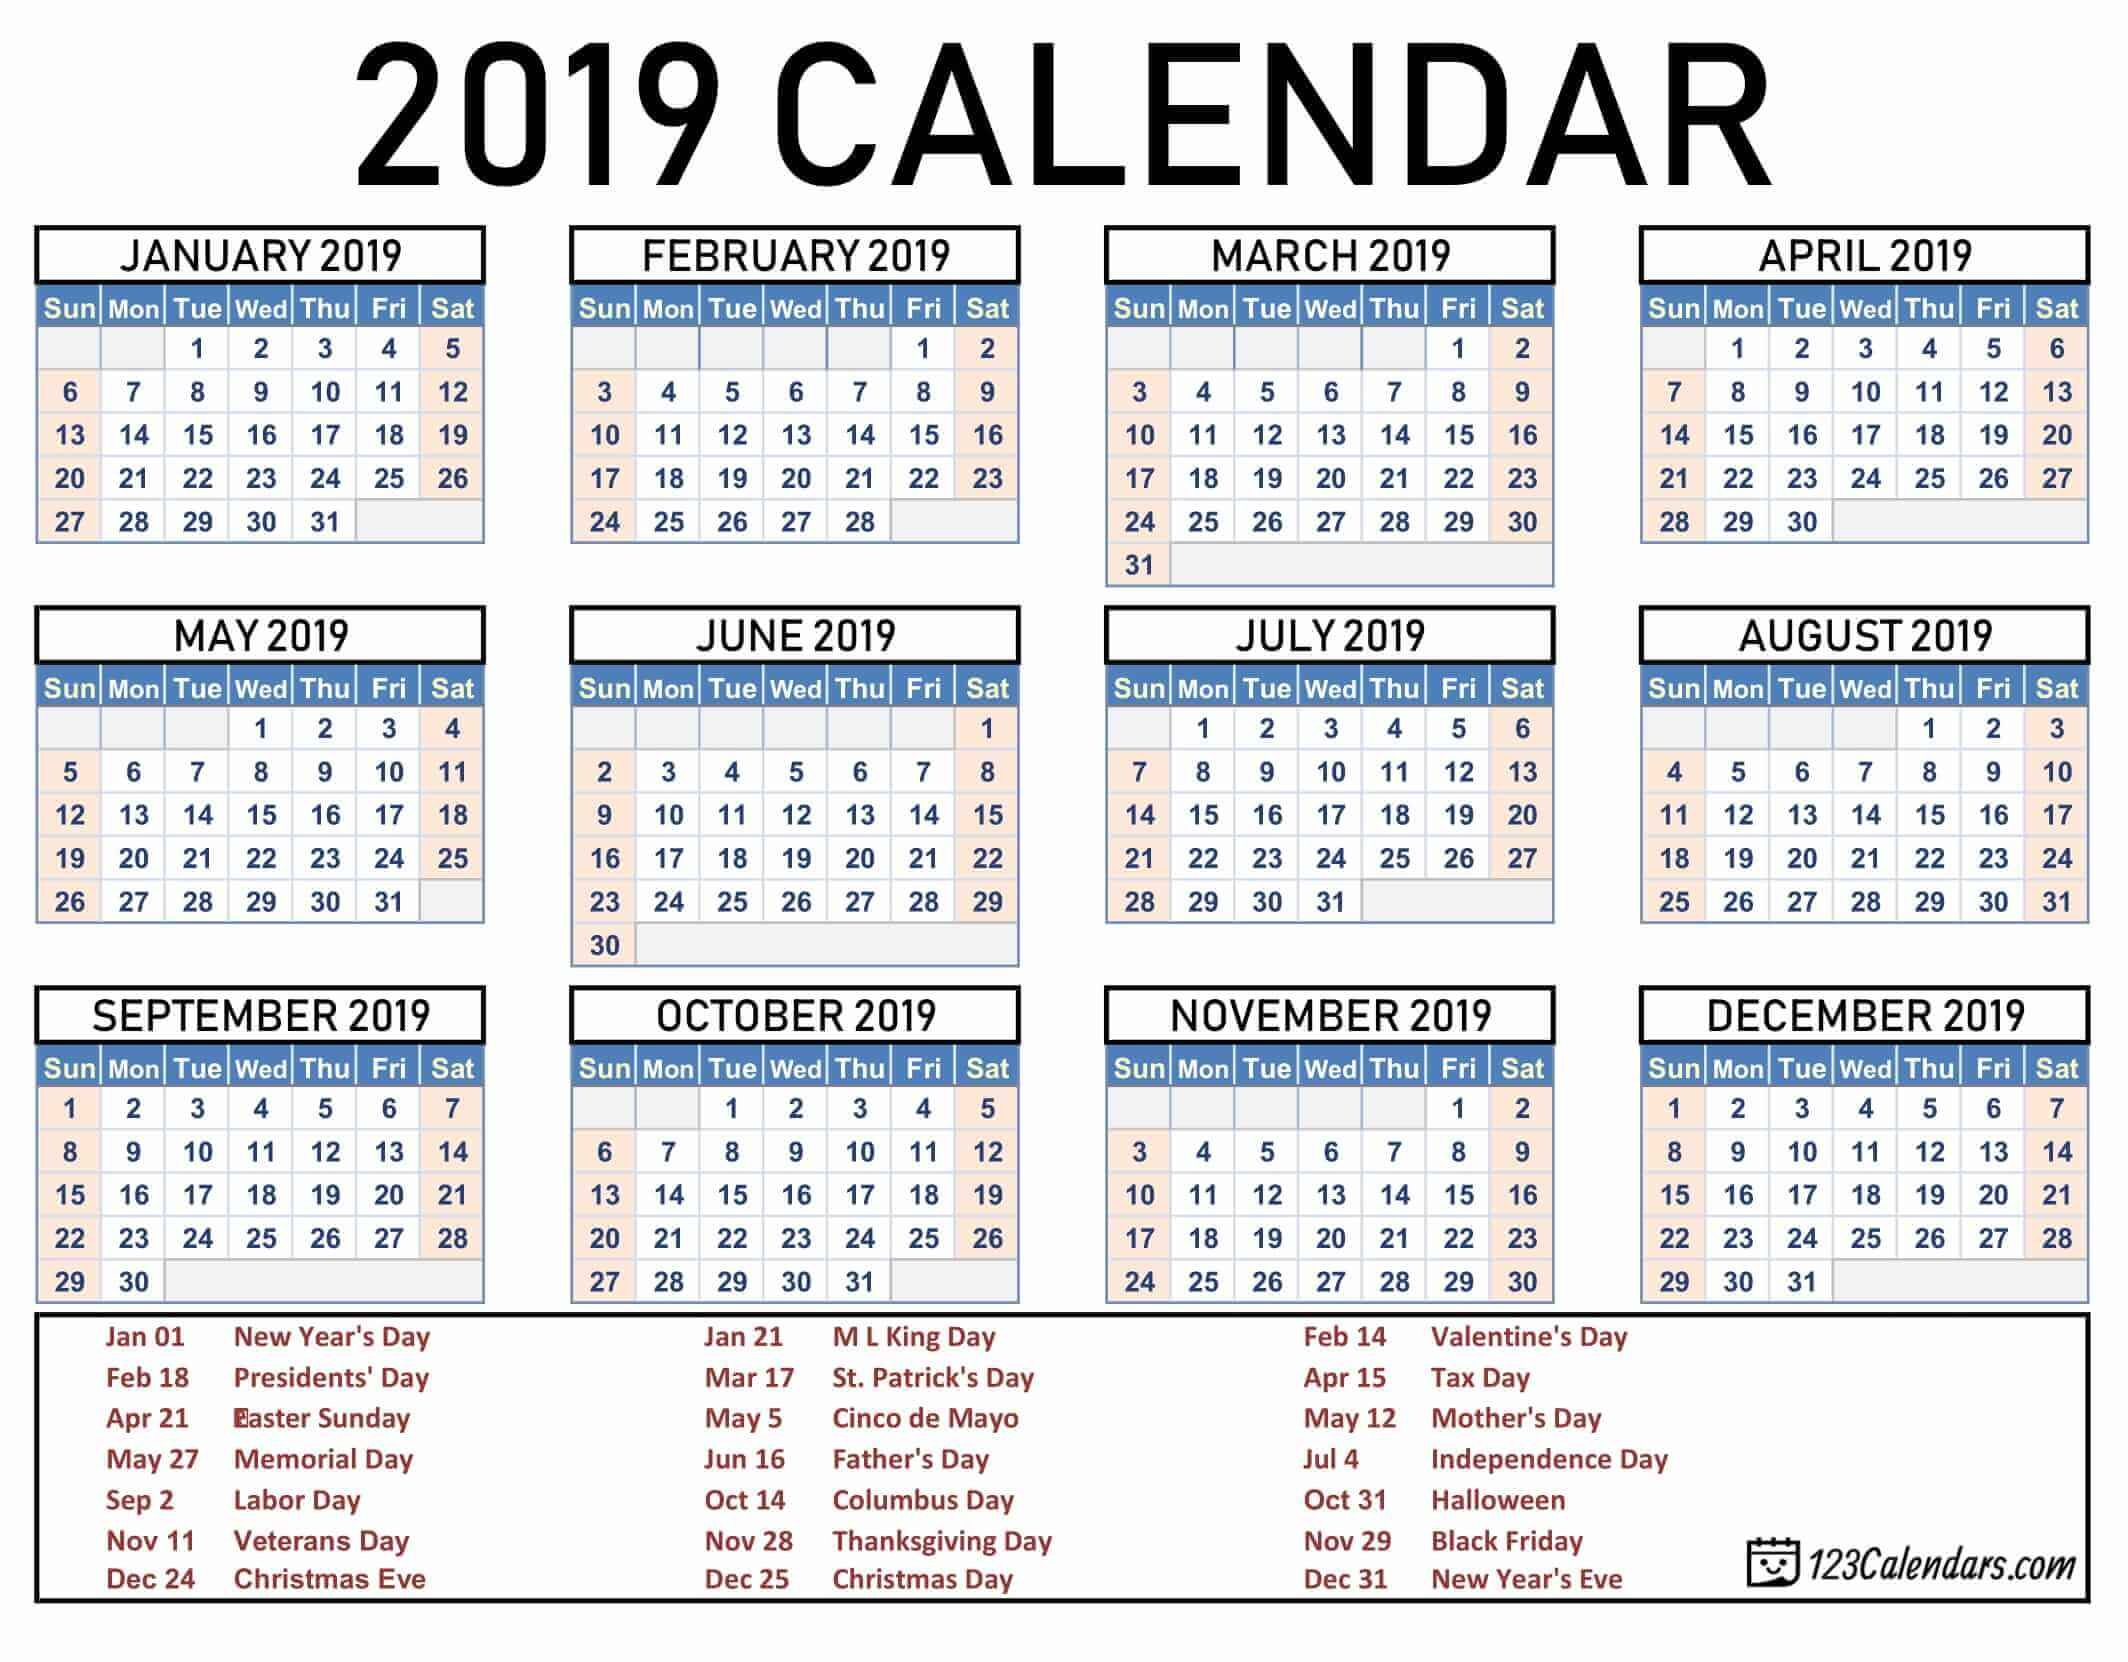 Free Printable 2019 Calendar | 123Calendars Calendar 2019